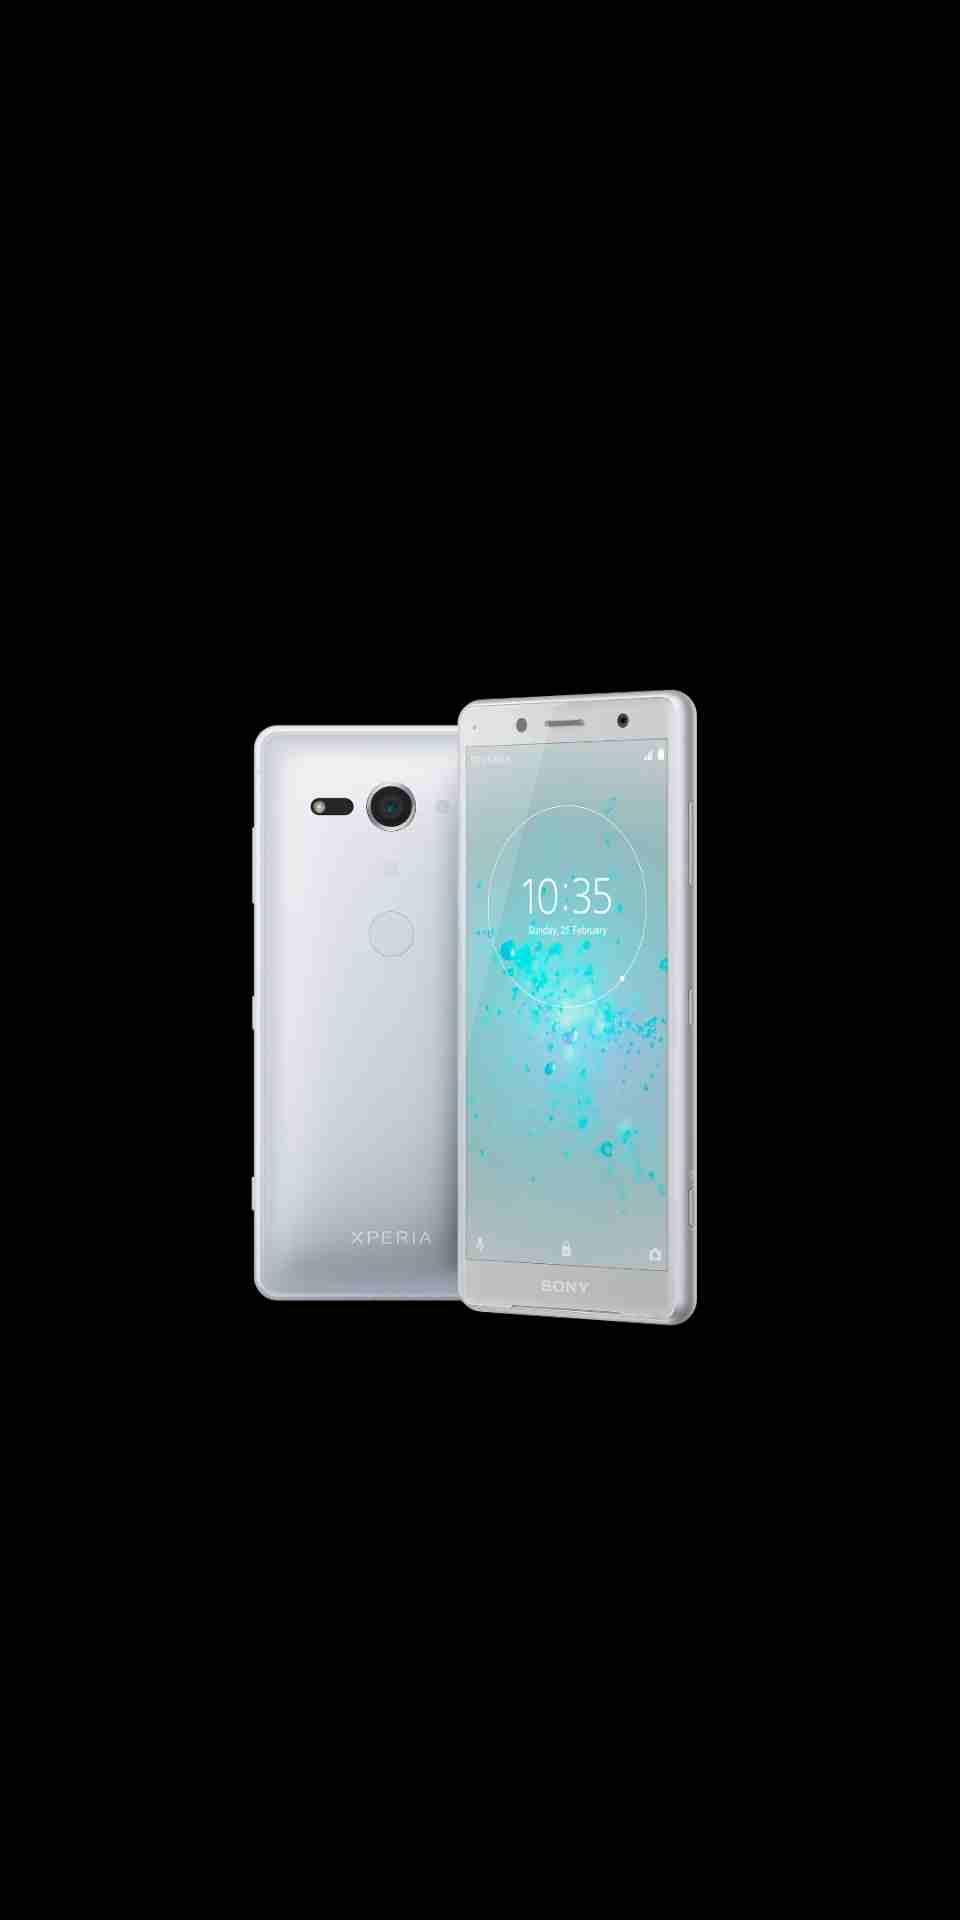 iPhone 11 64GB - $ 650 USDiPhone 11 128GB - $ 710 USDiPhone 11 256GB - $ 770 USDiPhone 11 Pro 64GB - $ 720 USDiPhone 11 Pro 256GB - $ 750 USDiPhone 11 Pro 512GB-  سوني اكسبيريا XZ2 Compact...